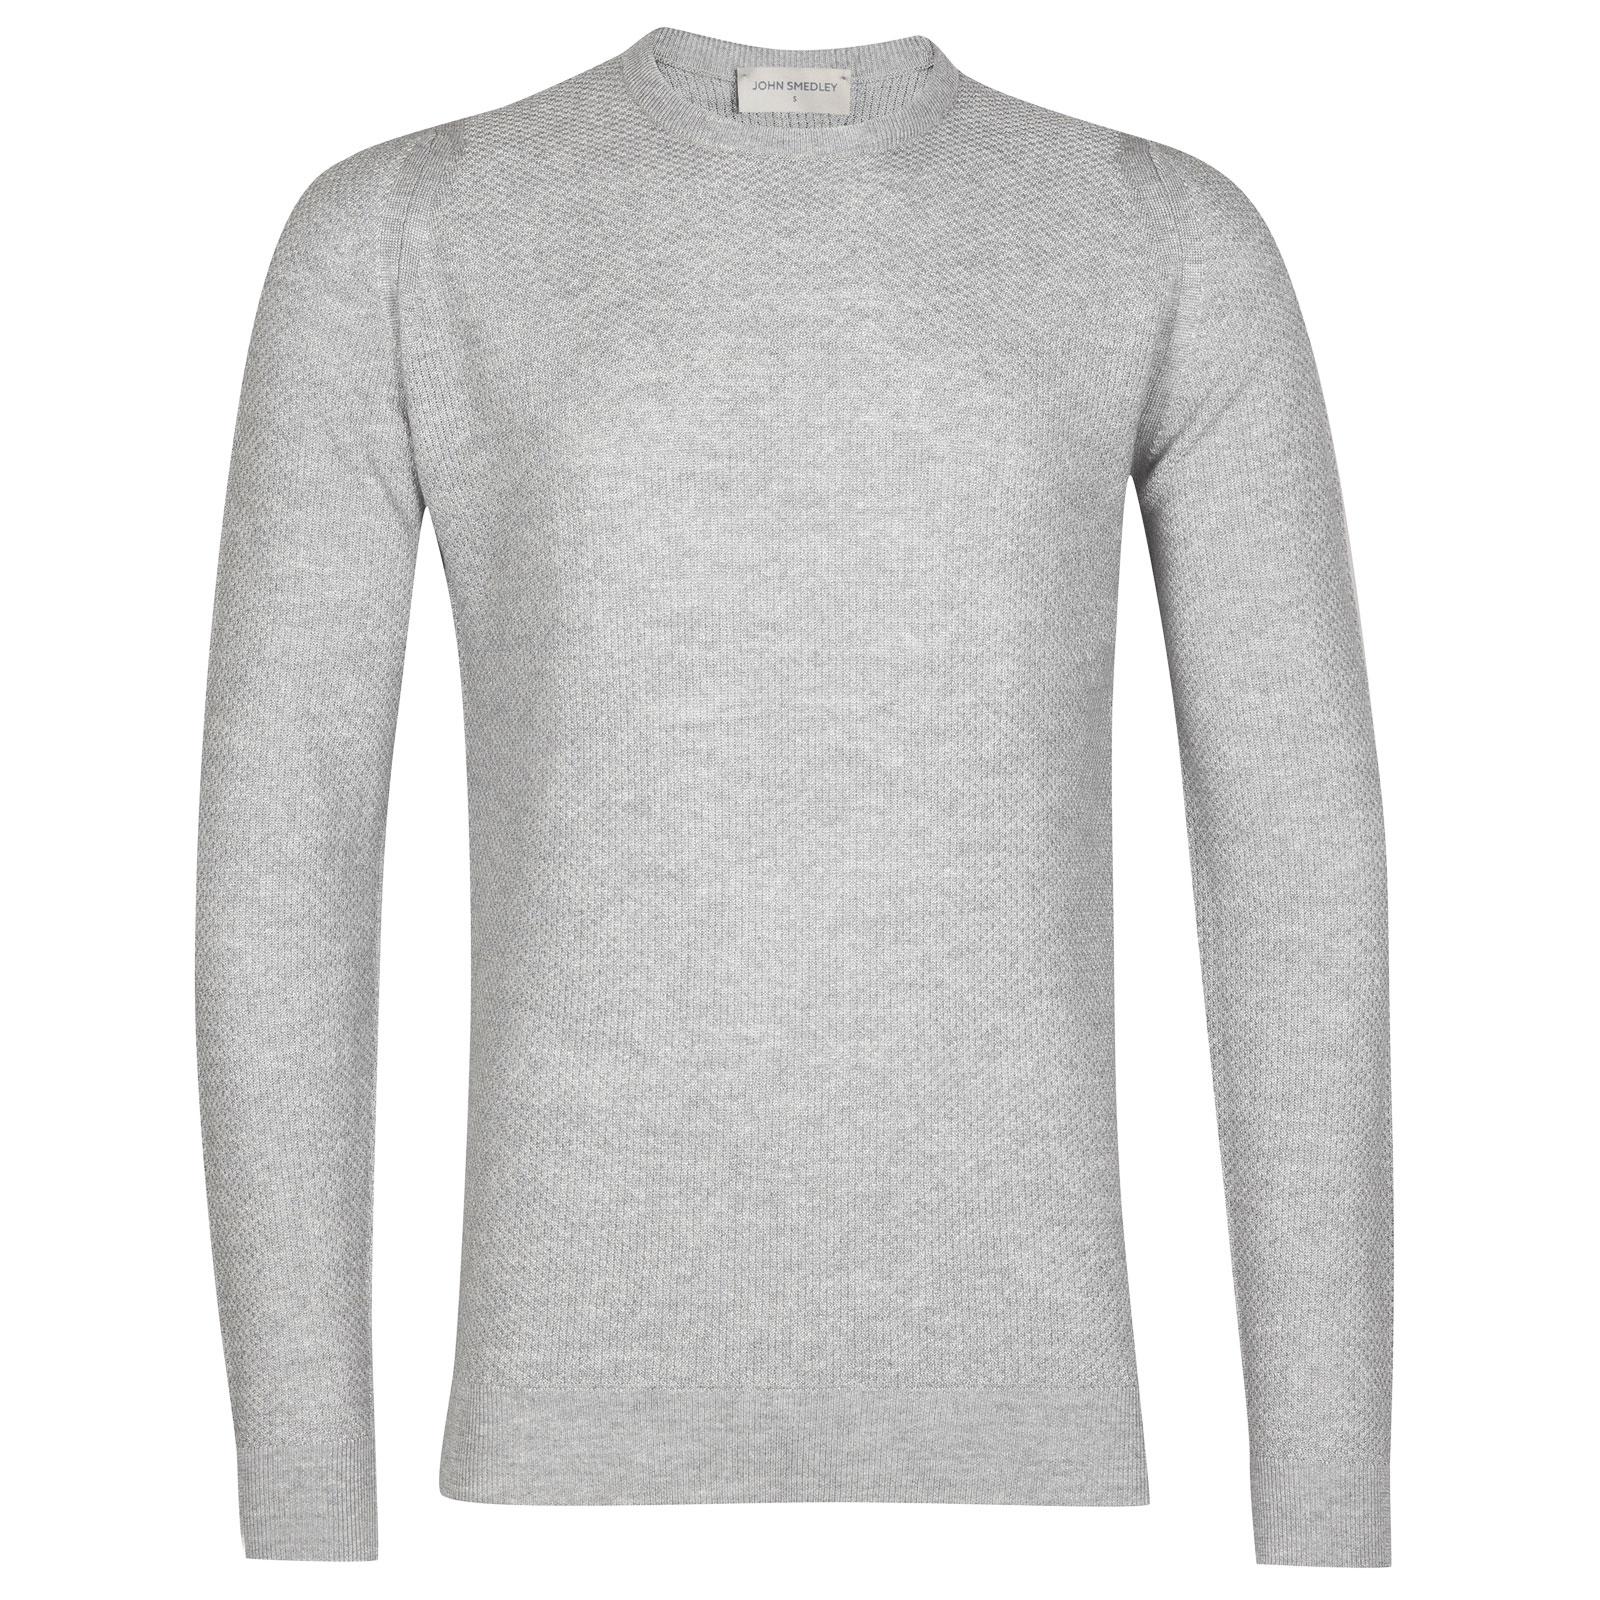 John Smedley 1Singular Merino Wool Pullover in Bardot Grey-XXL